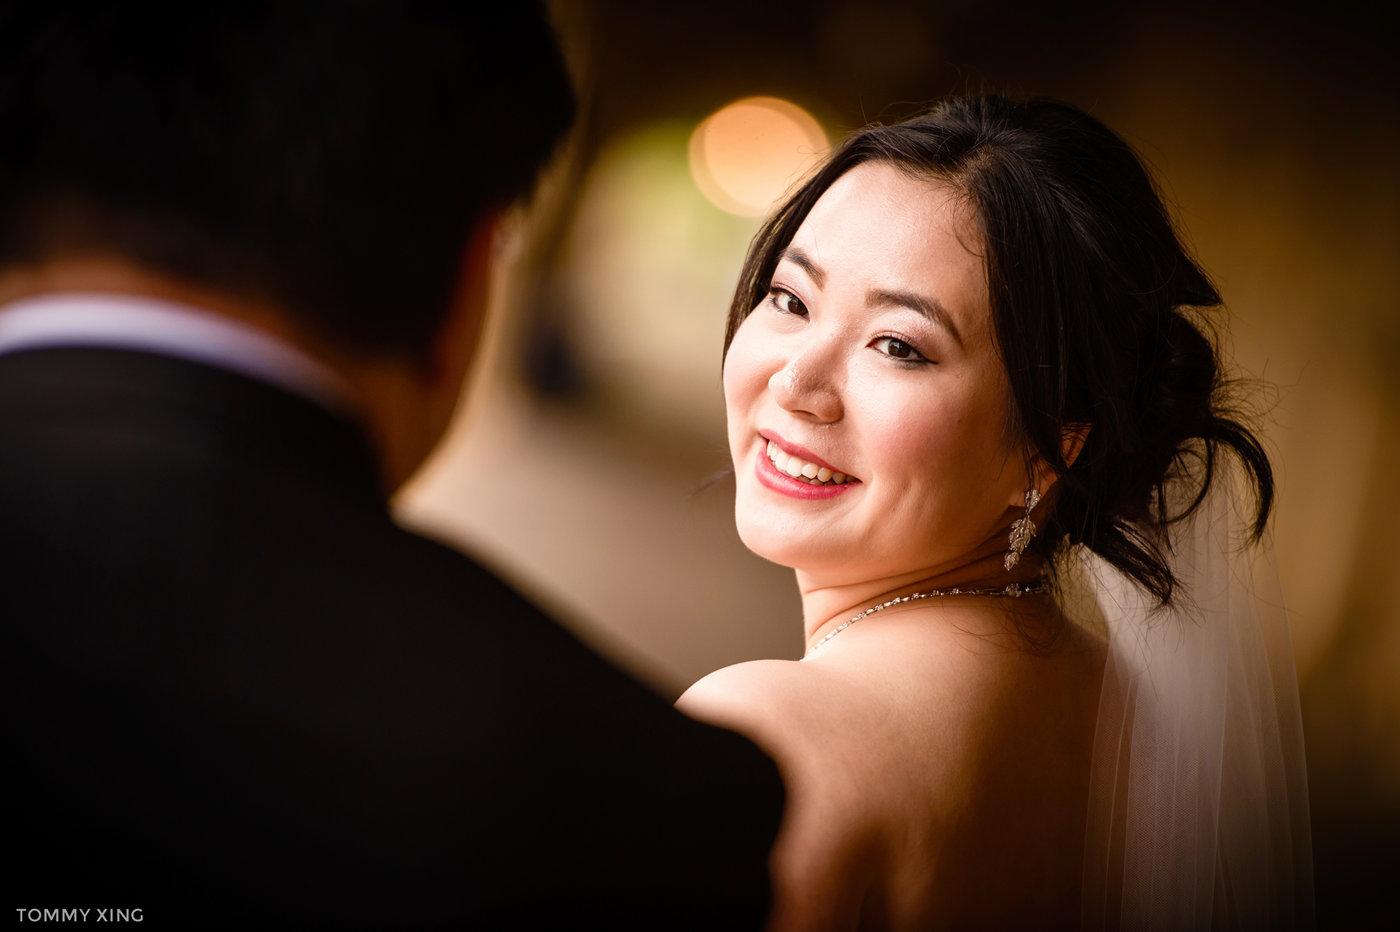 STANFORD MEMORIAL CHURCH WEDDING - Wenjie & Chengcheng - SAN FRANCISCO BAY AREA 斯坦福教堂婚礼跟拍 - 洛杉矶婚礼婚纱照摄影师 Tommy Xing Photography153.jpg